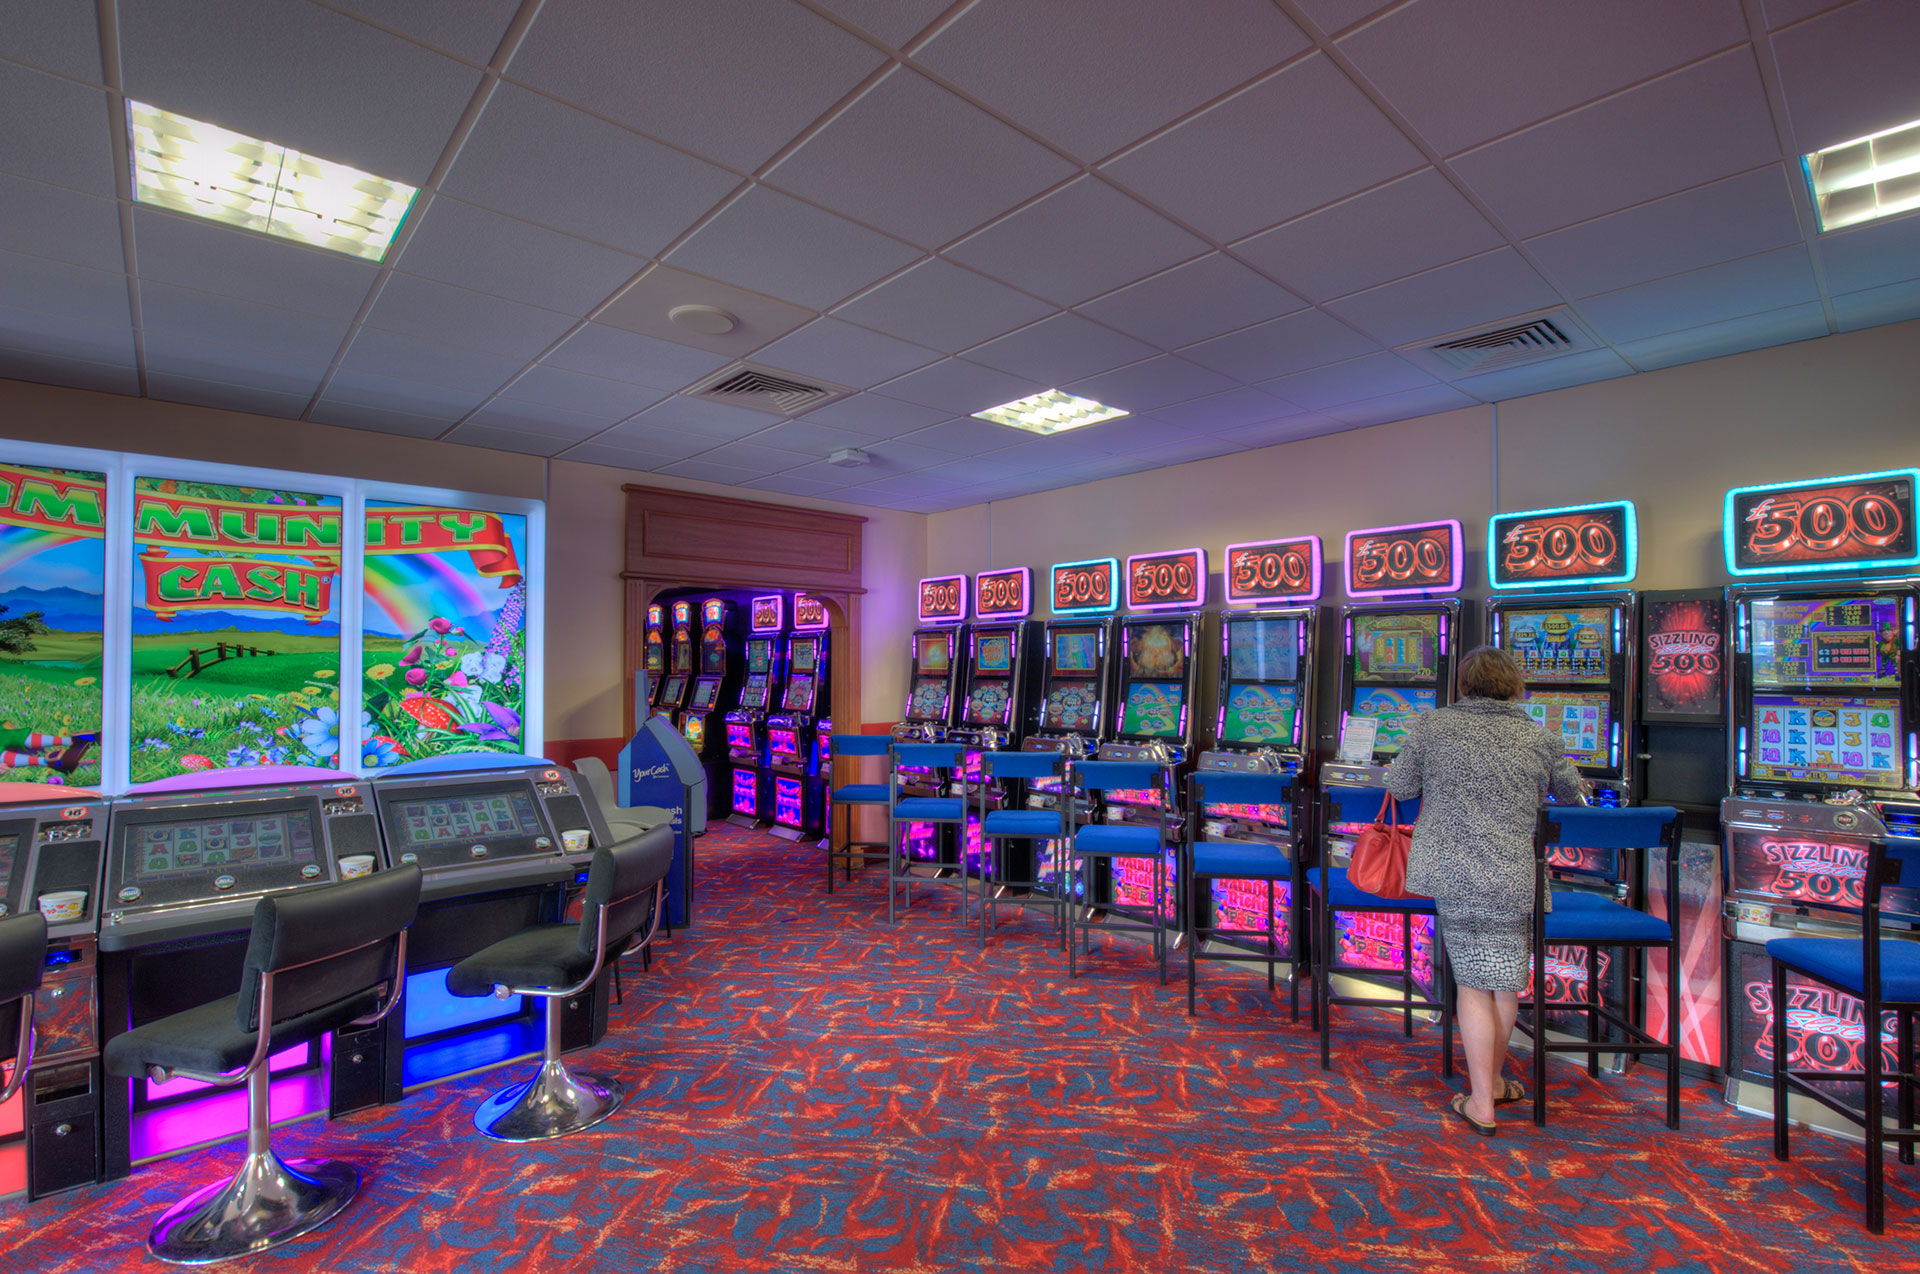 Majestic Bingo arcade room